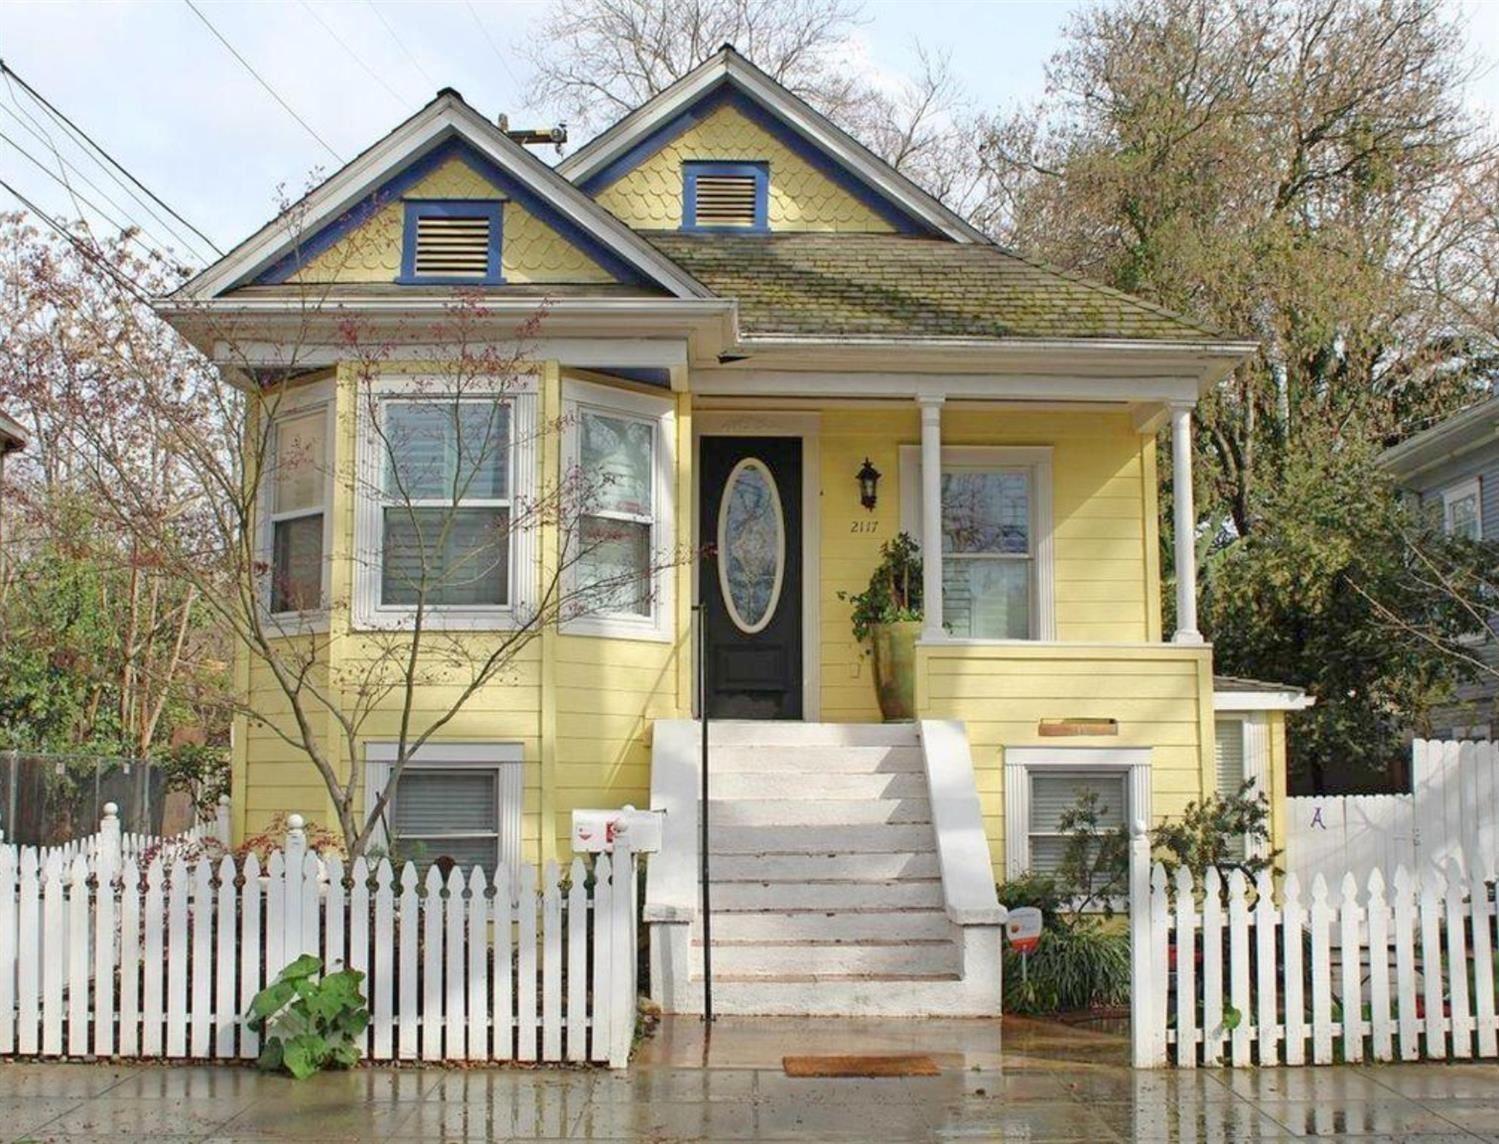 Photo of 2117 3rd Street, Sacramento, CA 95818 (MLS # 221049654)